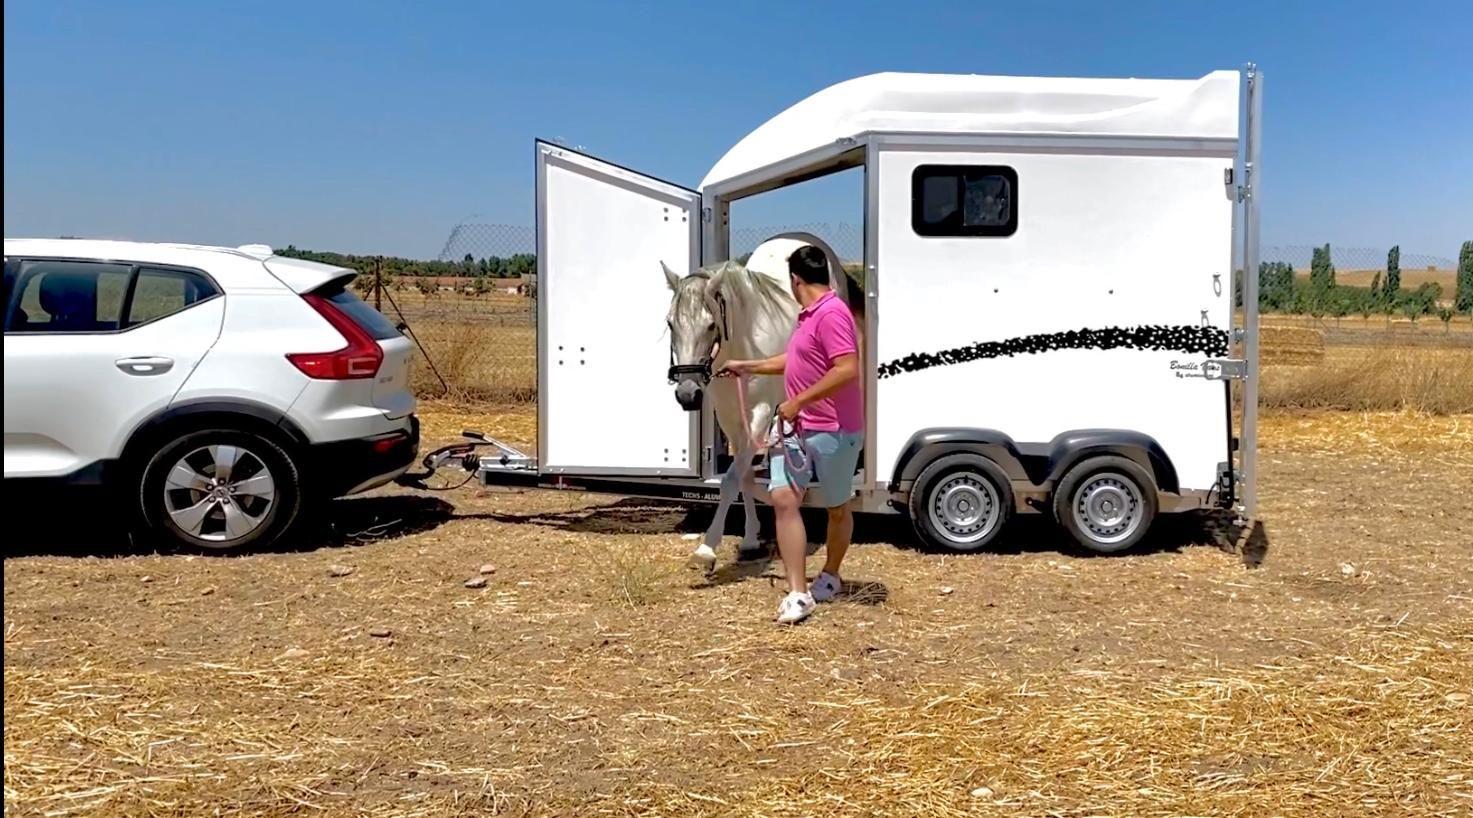 Remolques para caballos Sevilla